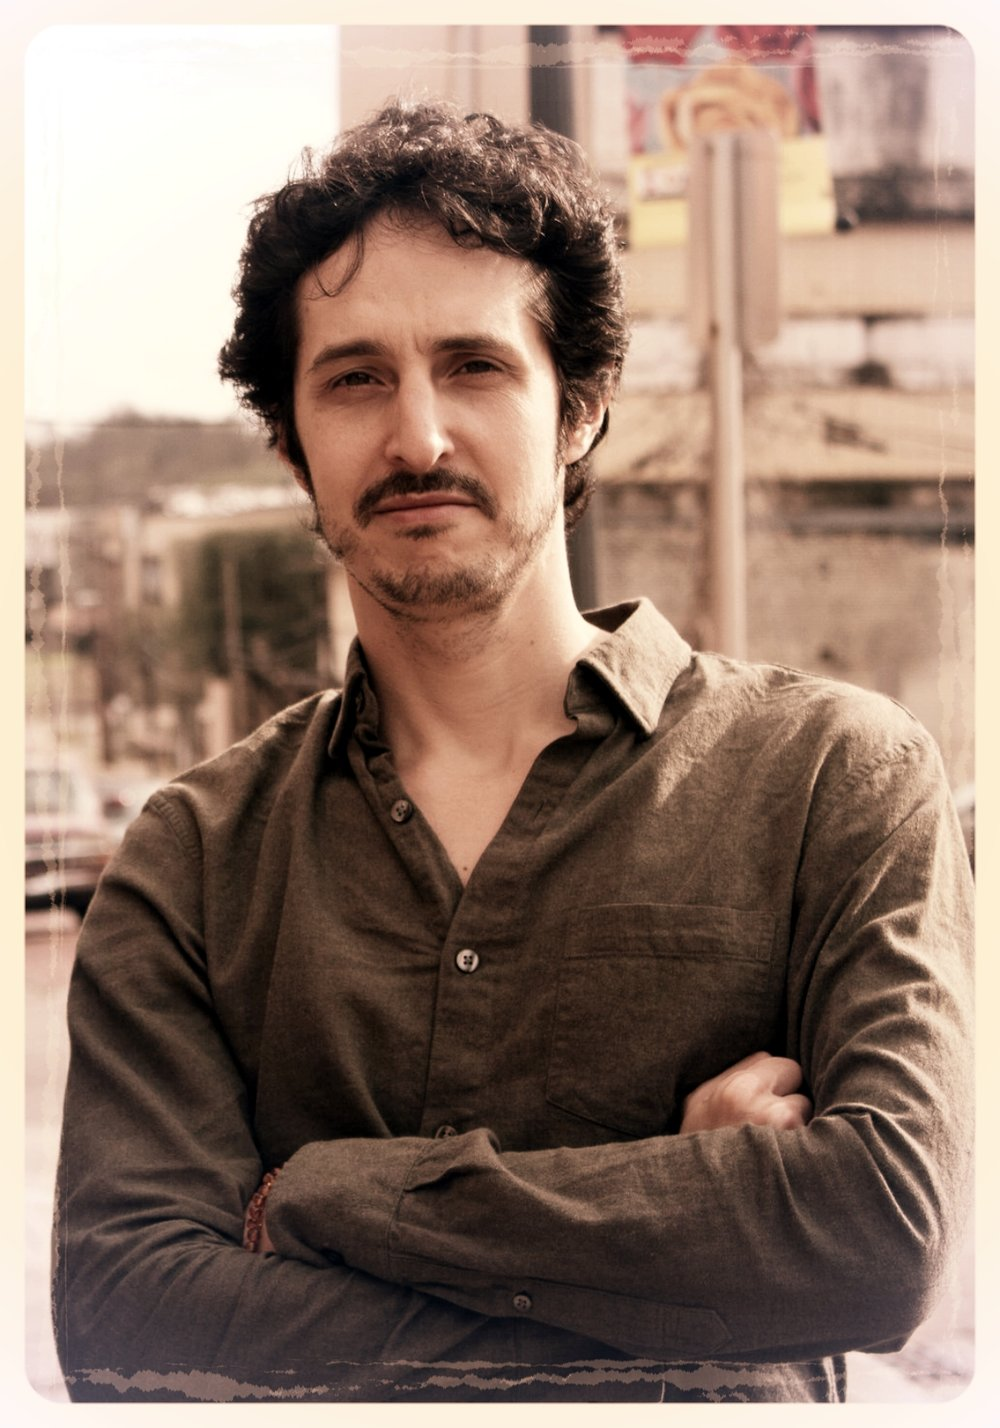 Joel Fendelman